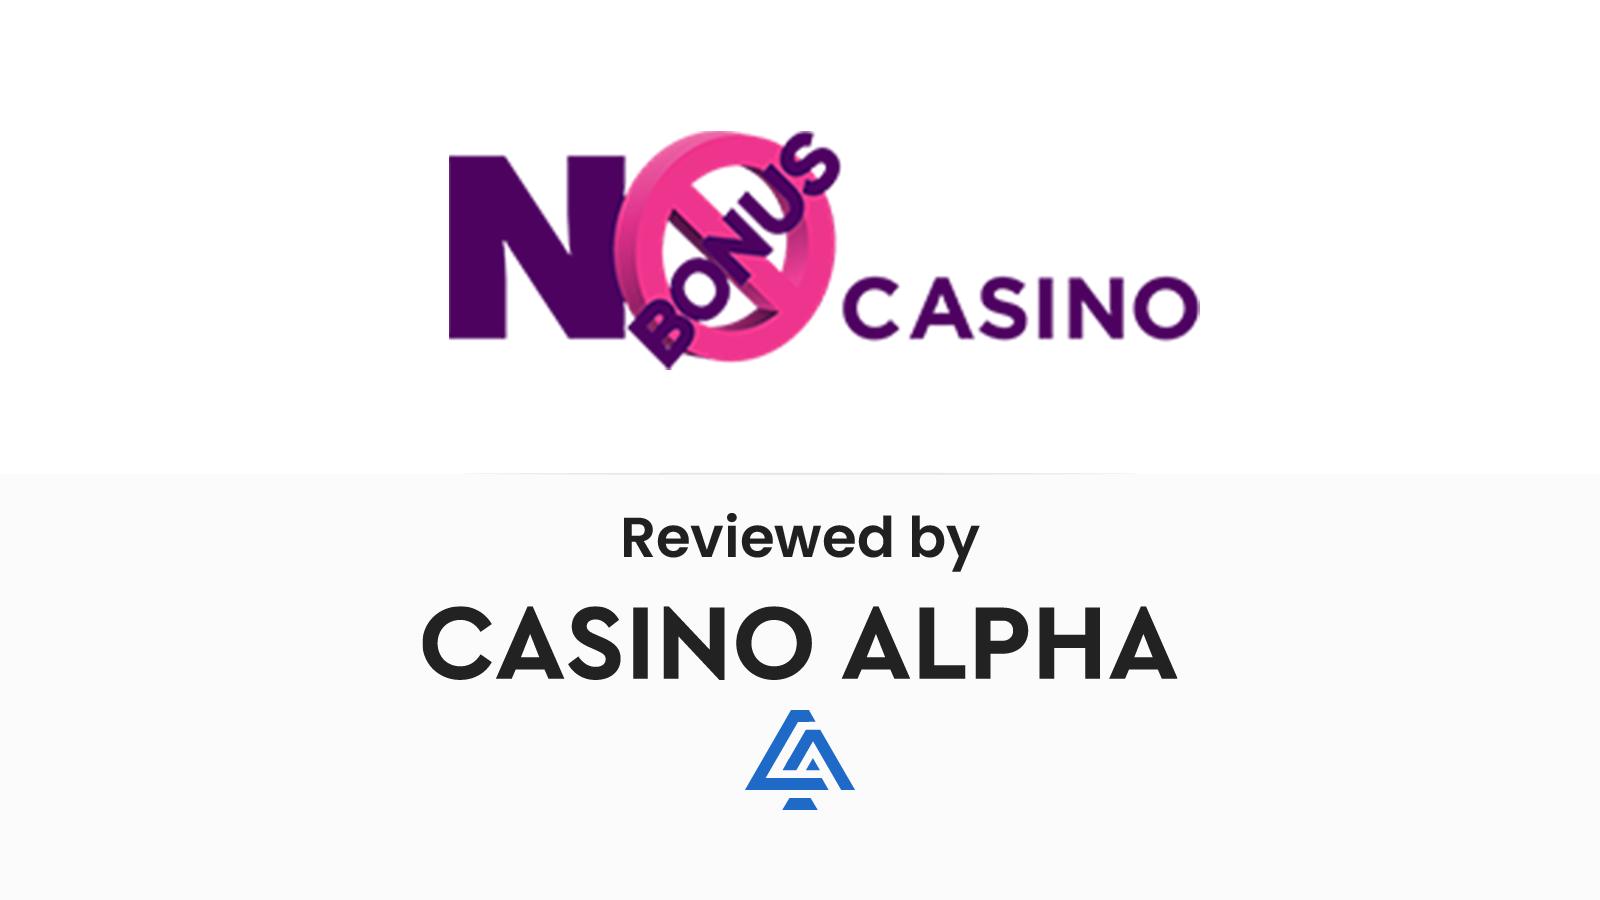 No Bonus Casino Review & Promotions List